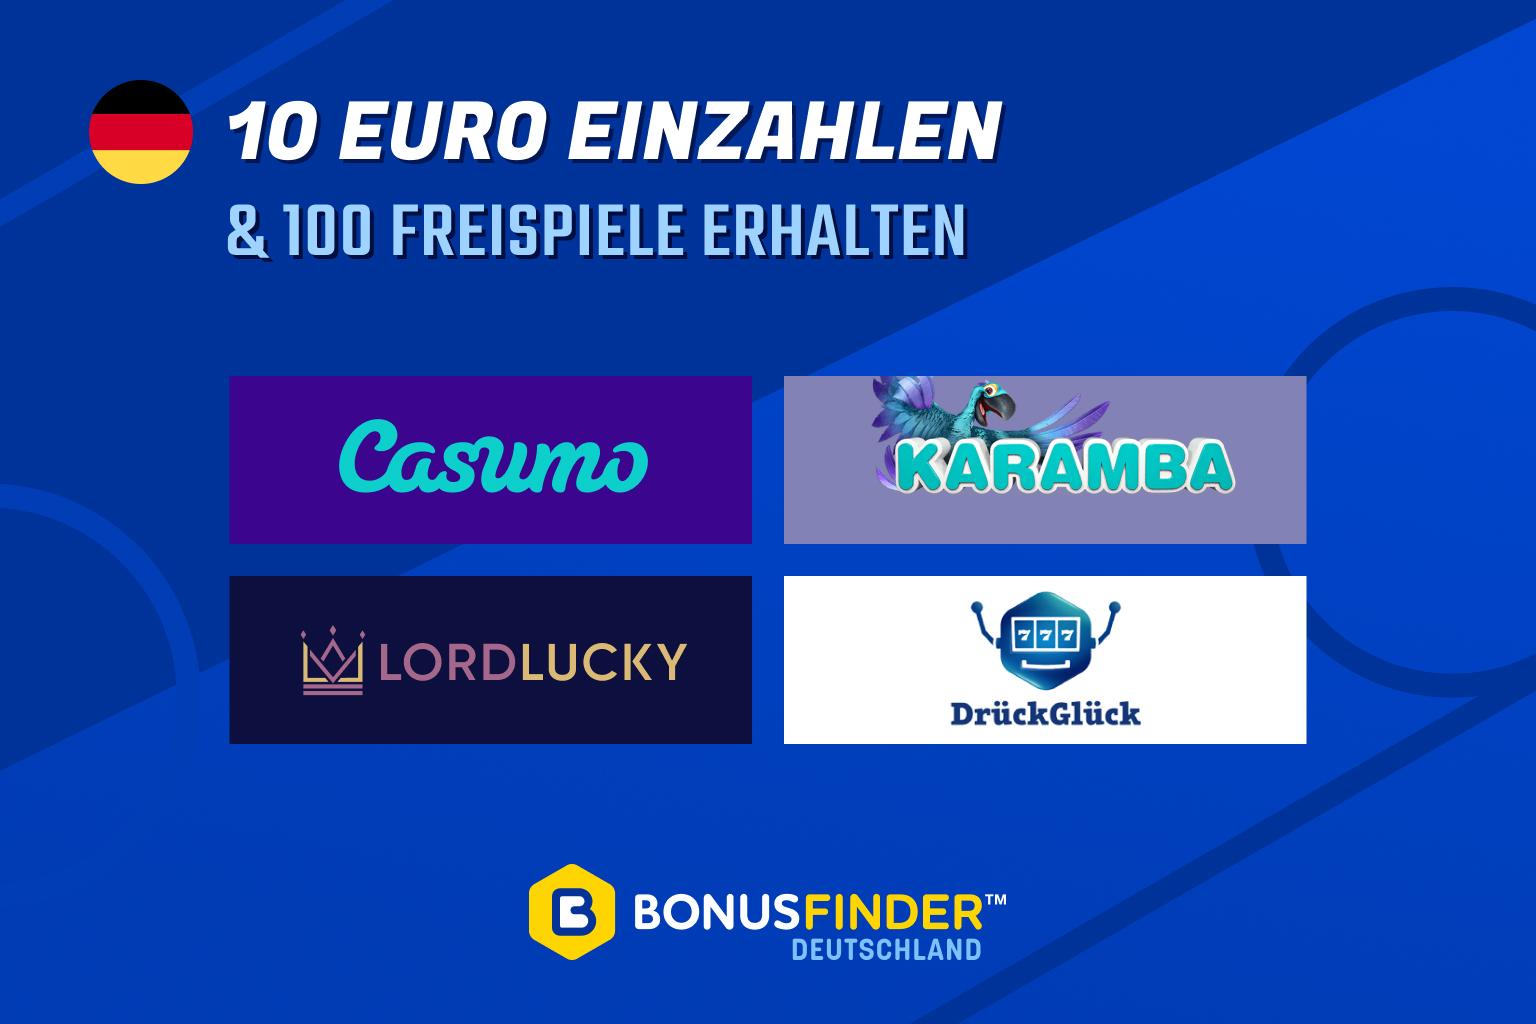 10 euro einzahlen 100 freispiele